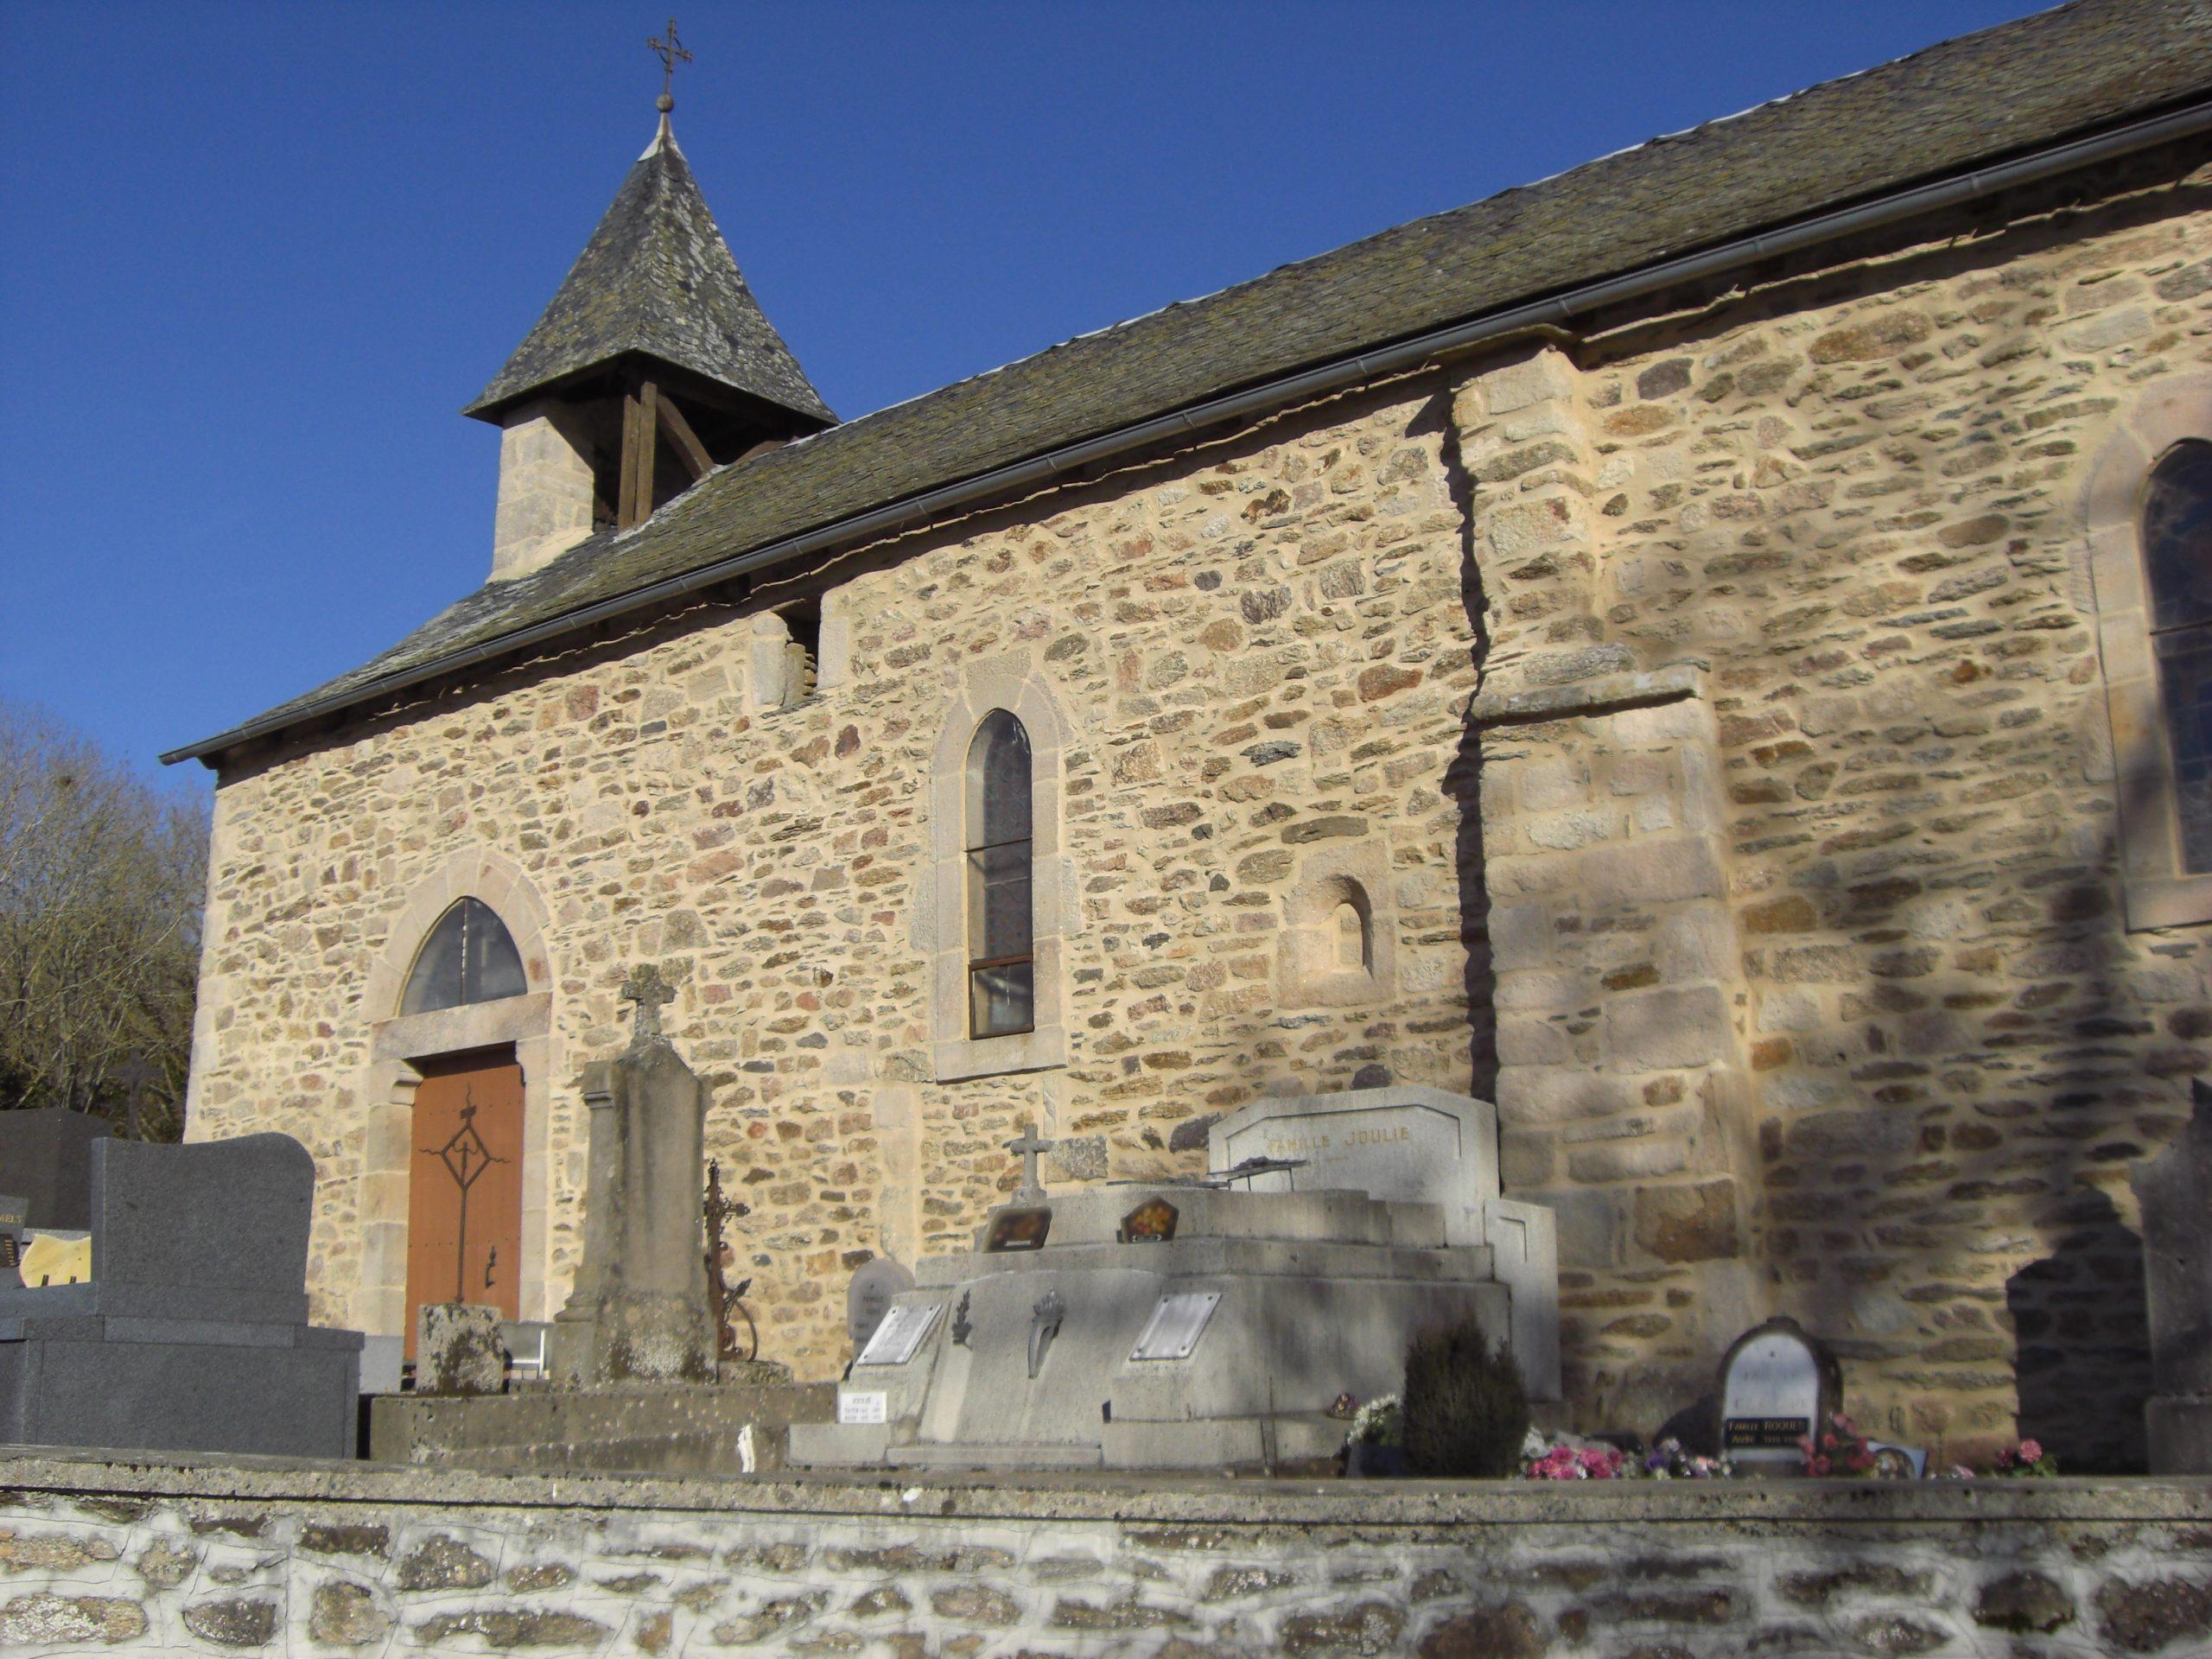 Eglise de Prades-de-Salars